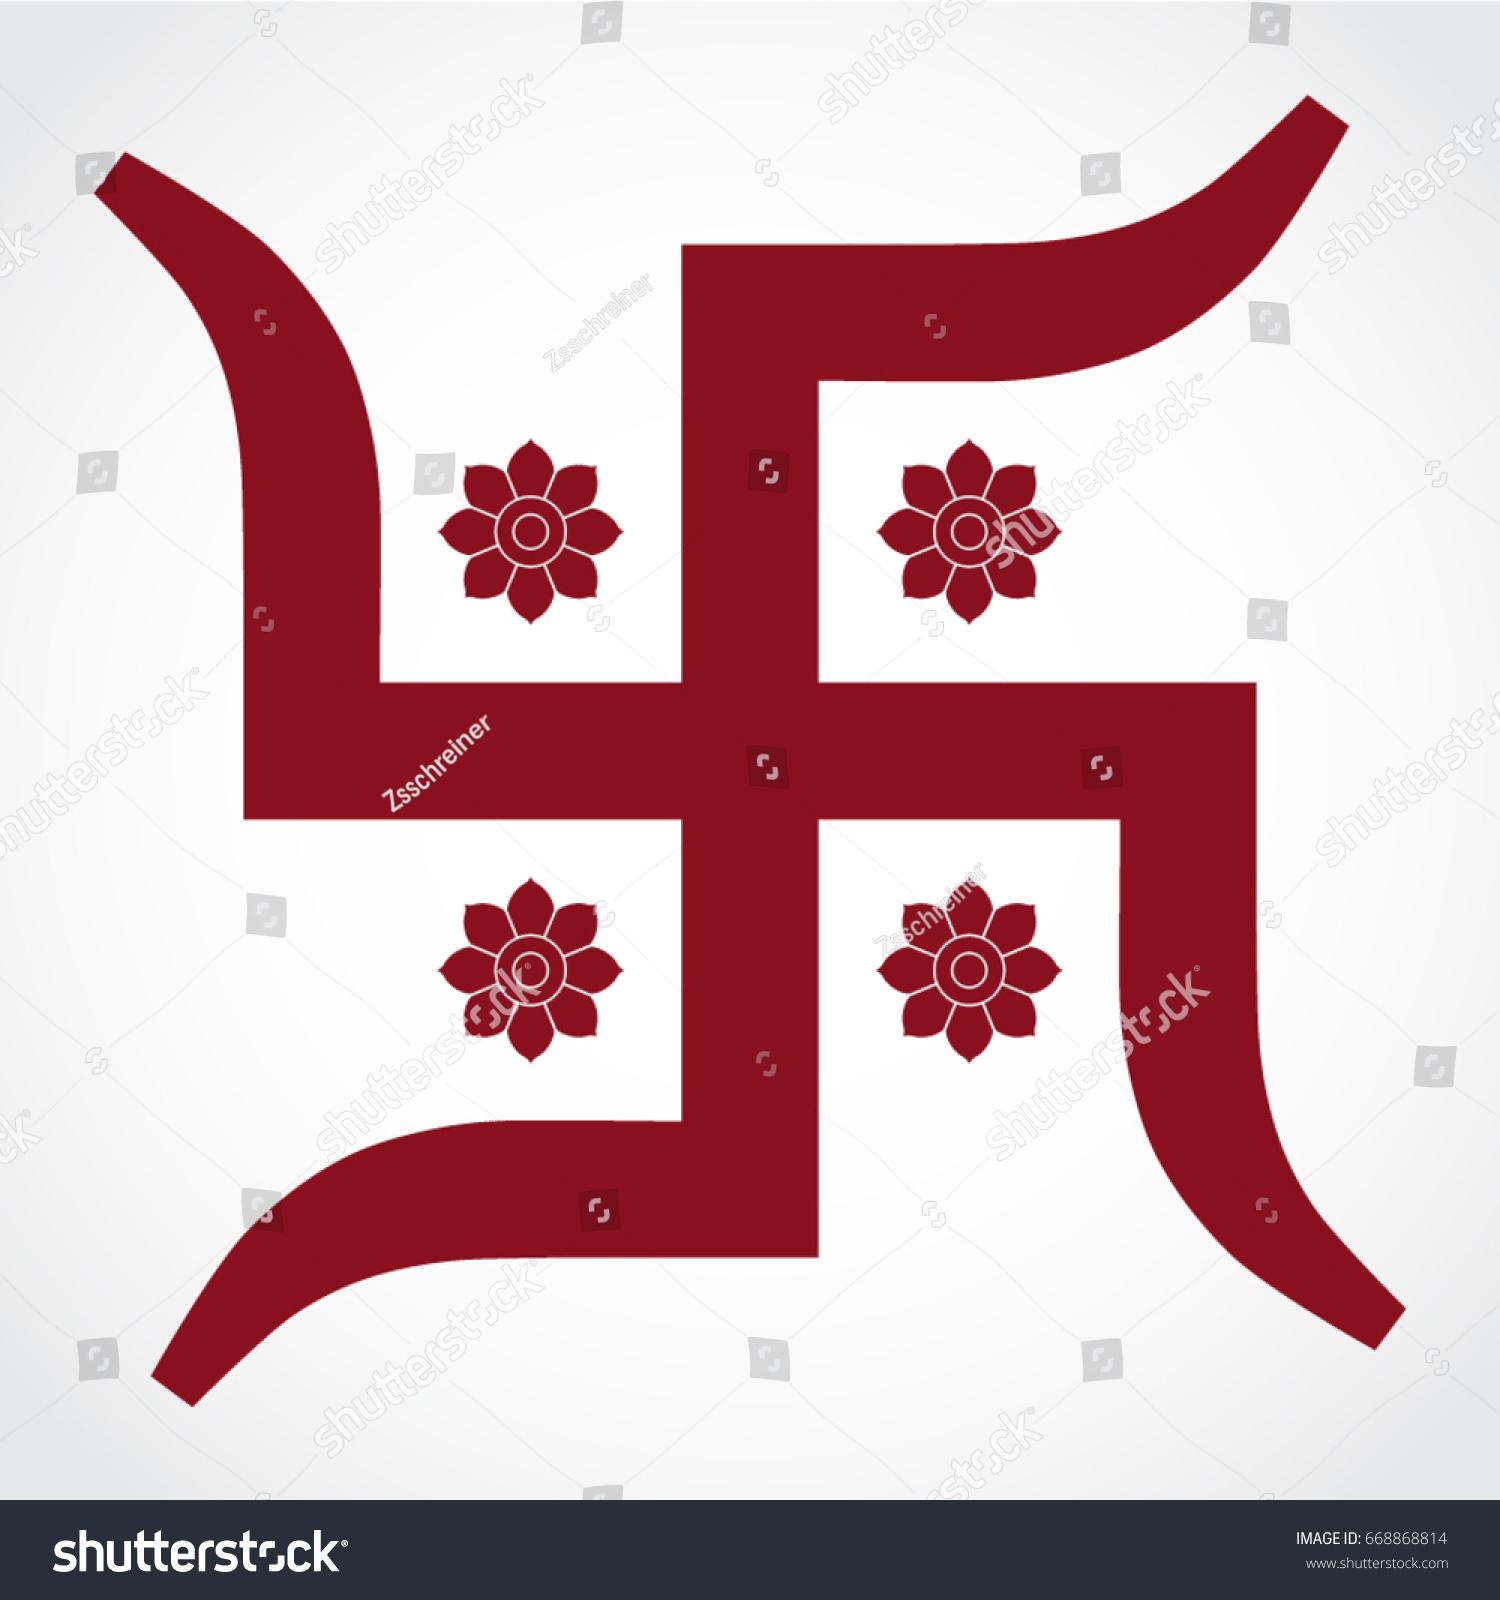 Hindu swastika religious symbol stock vector 668868814 shutterstock hindu swastika religious symbol biocorpaavc